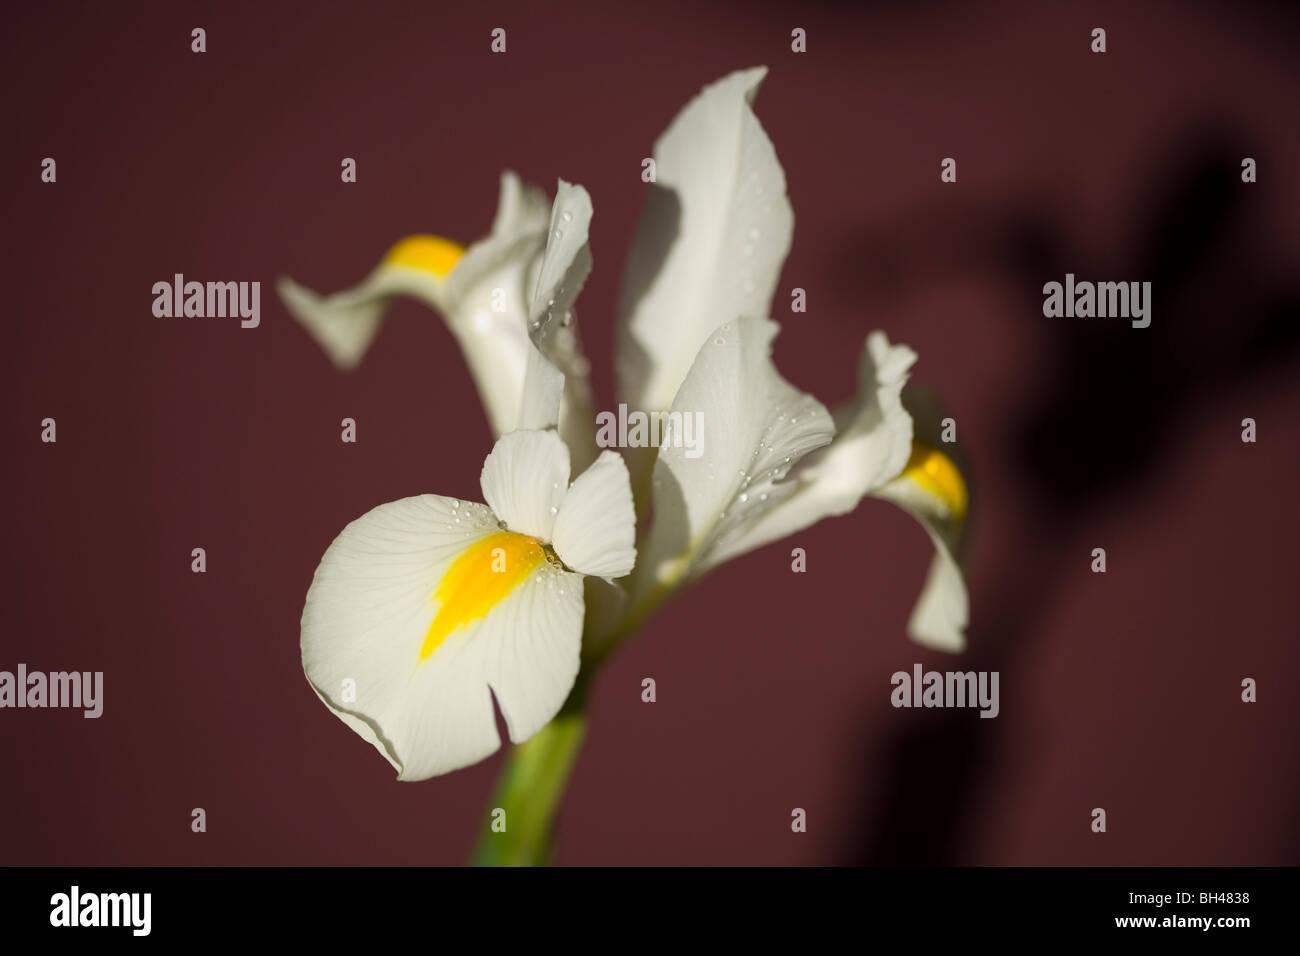 Iris (iridaceae) and shadow. - Stock Image